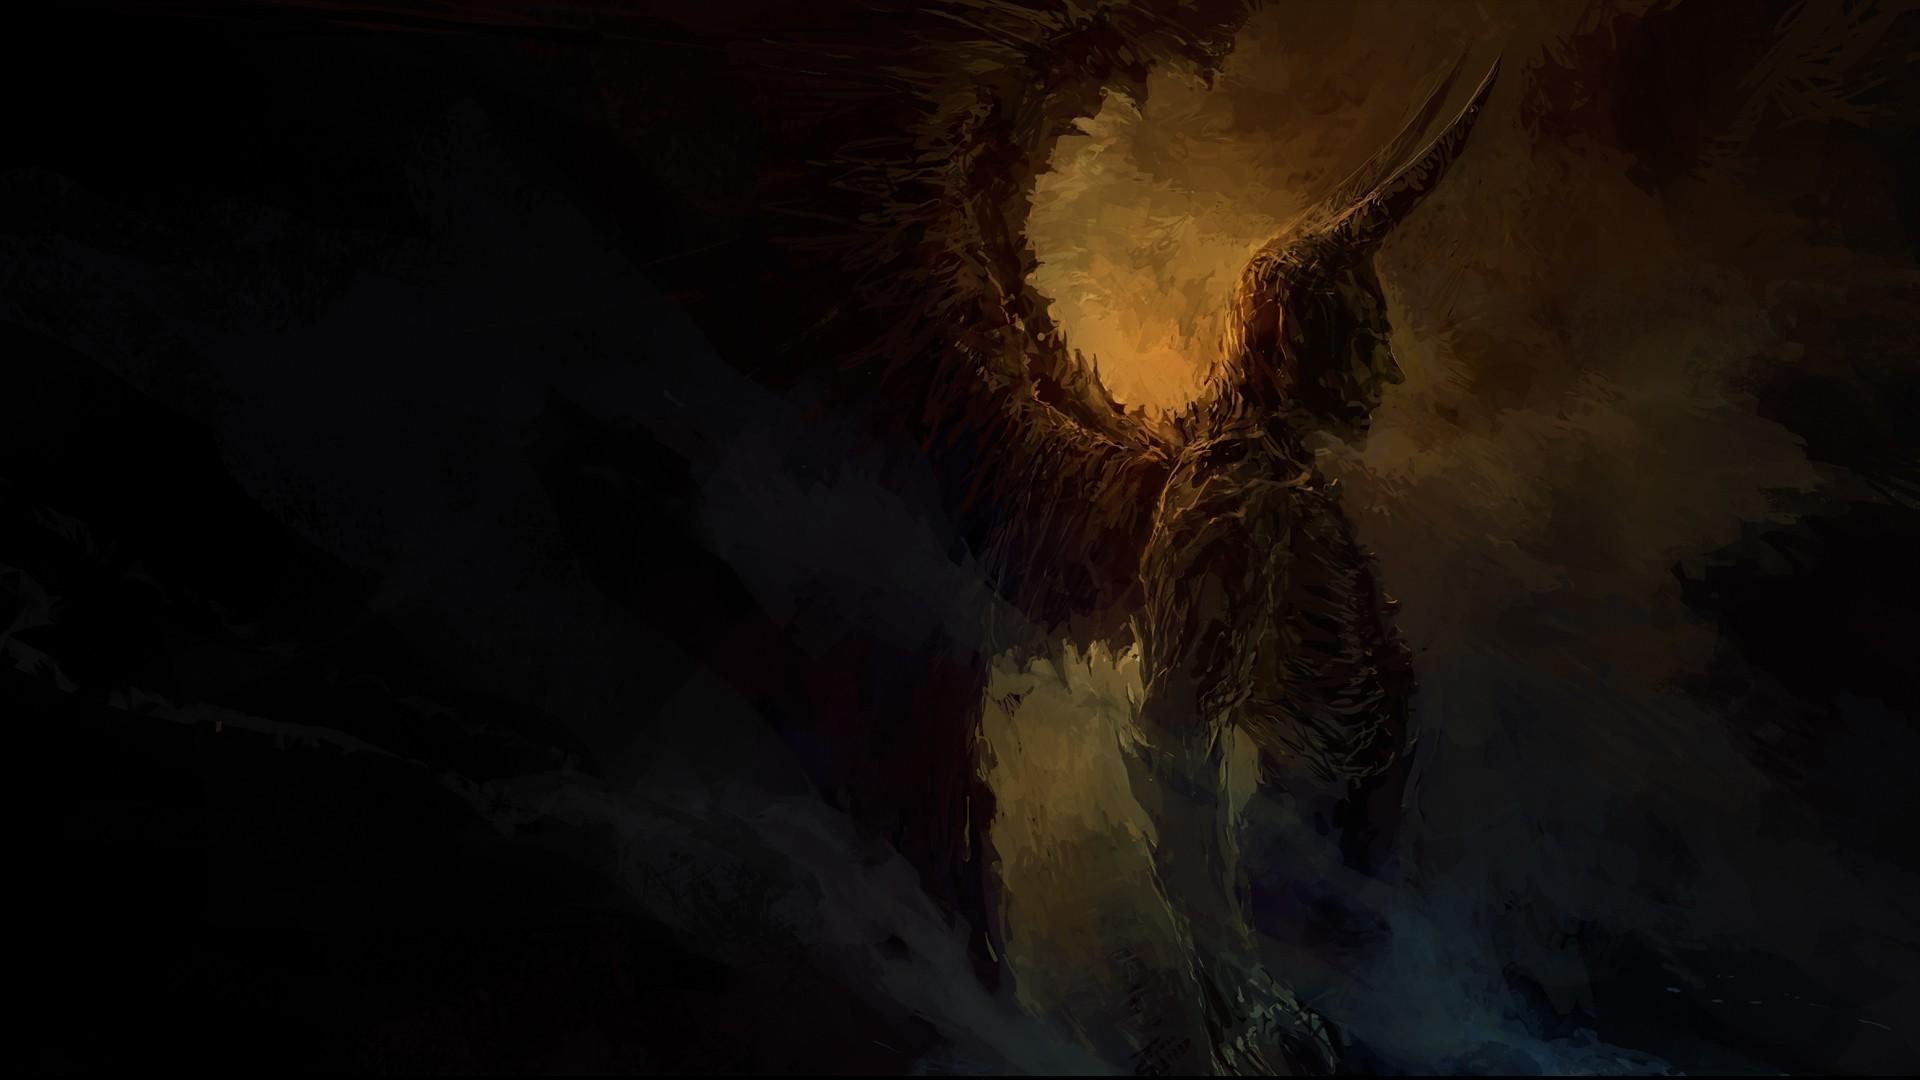 Devil wallpaper 15344 1920x1080